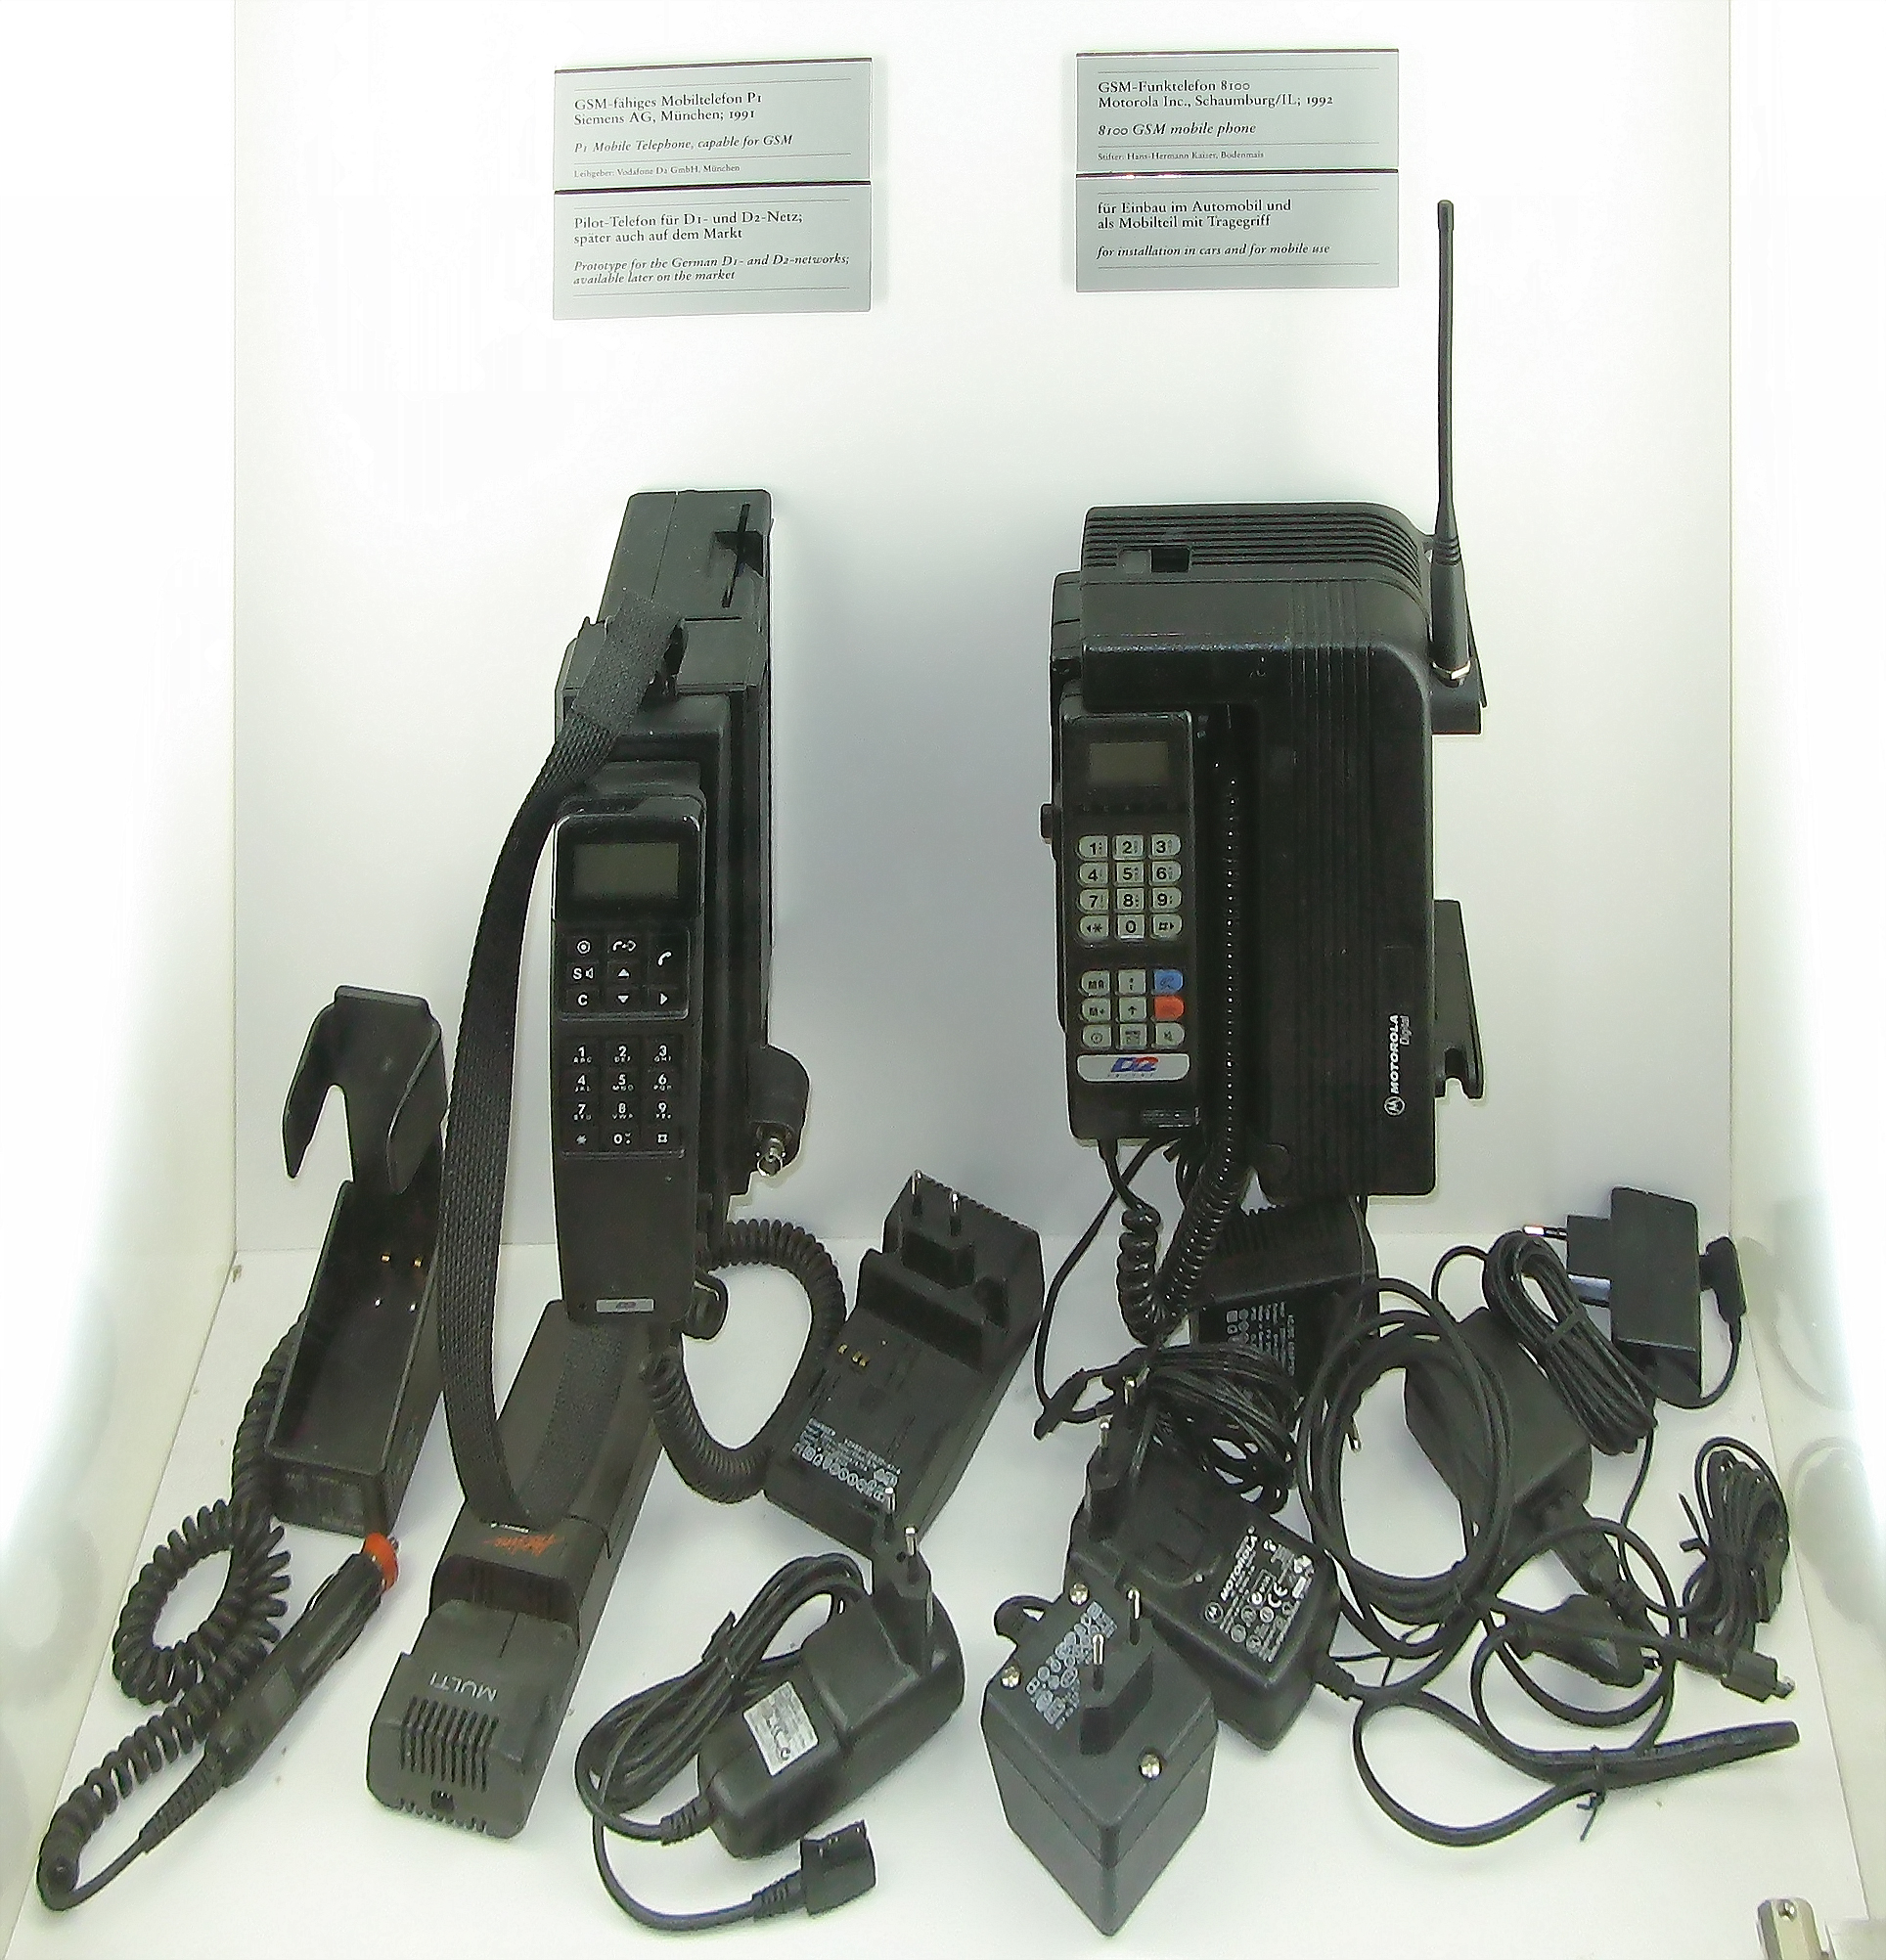 FileGSM Telefone 1991